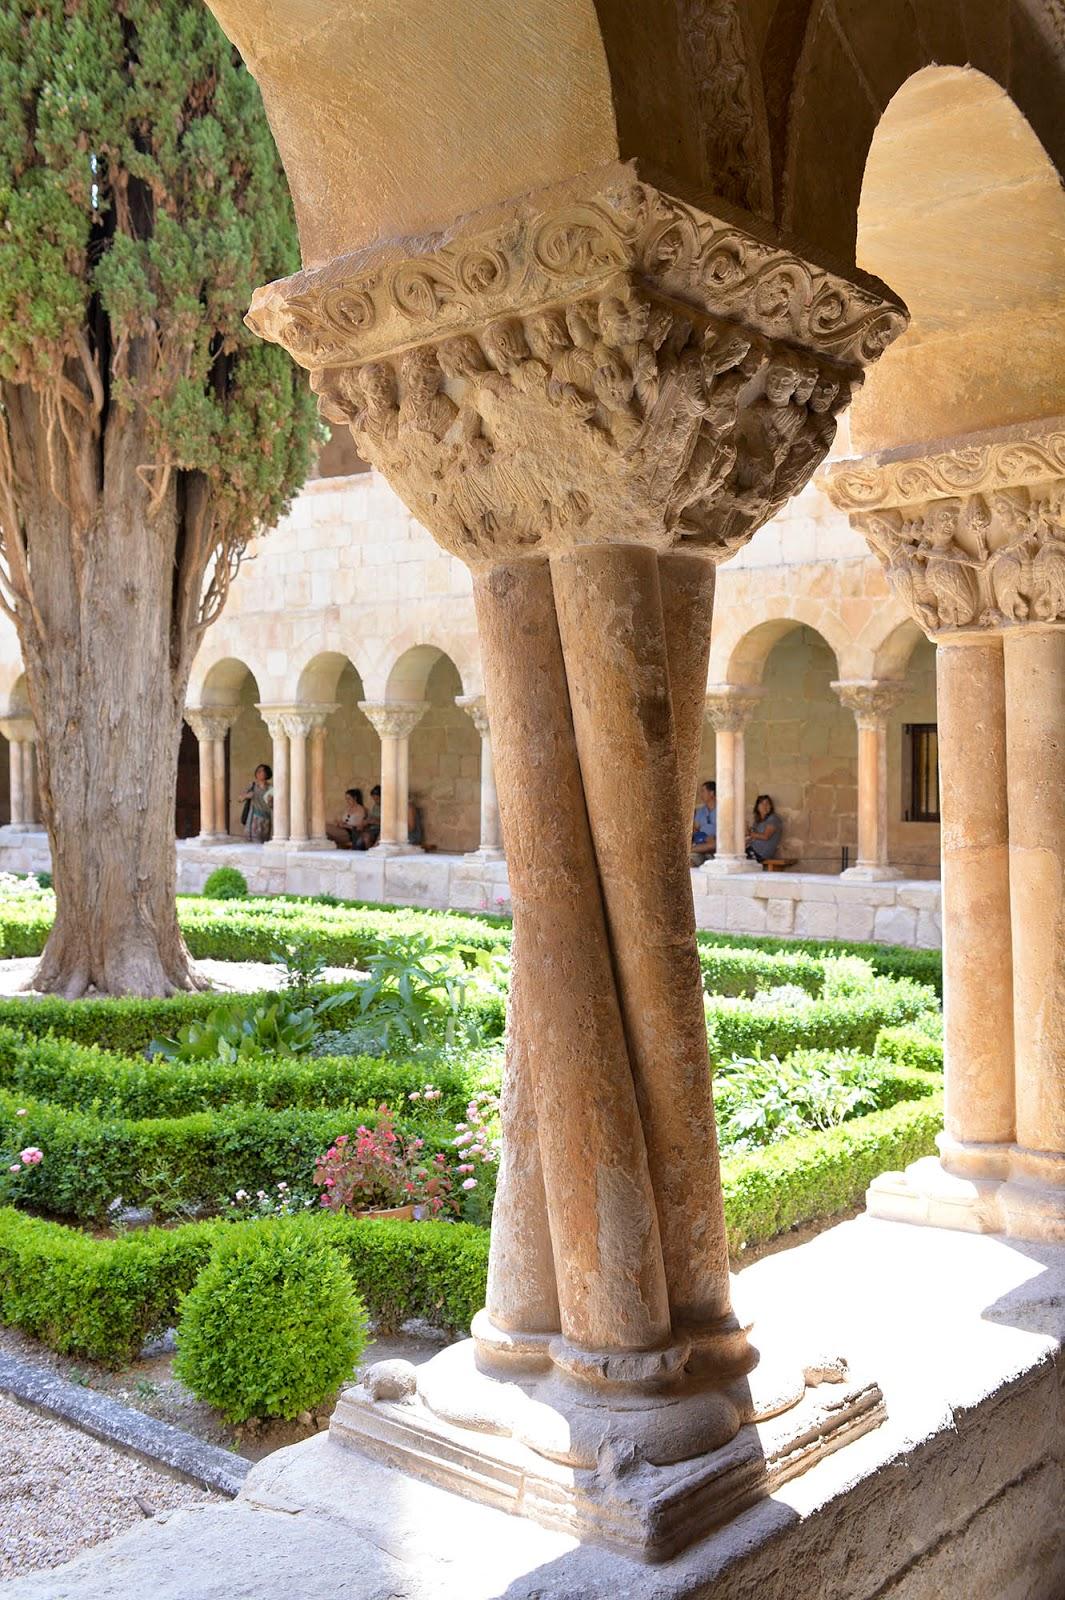 silos monastery santo domingo burgos spain castile leon cloister